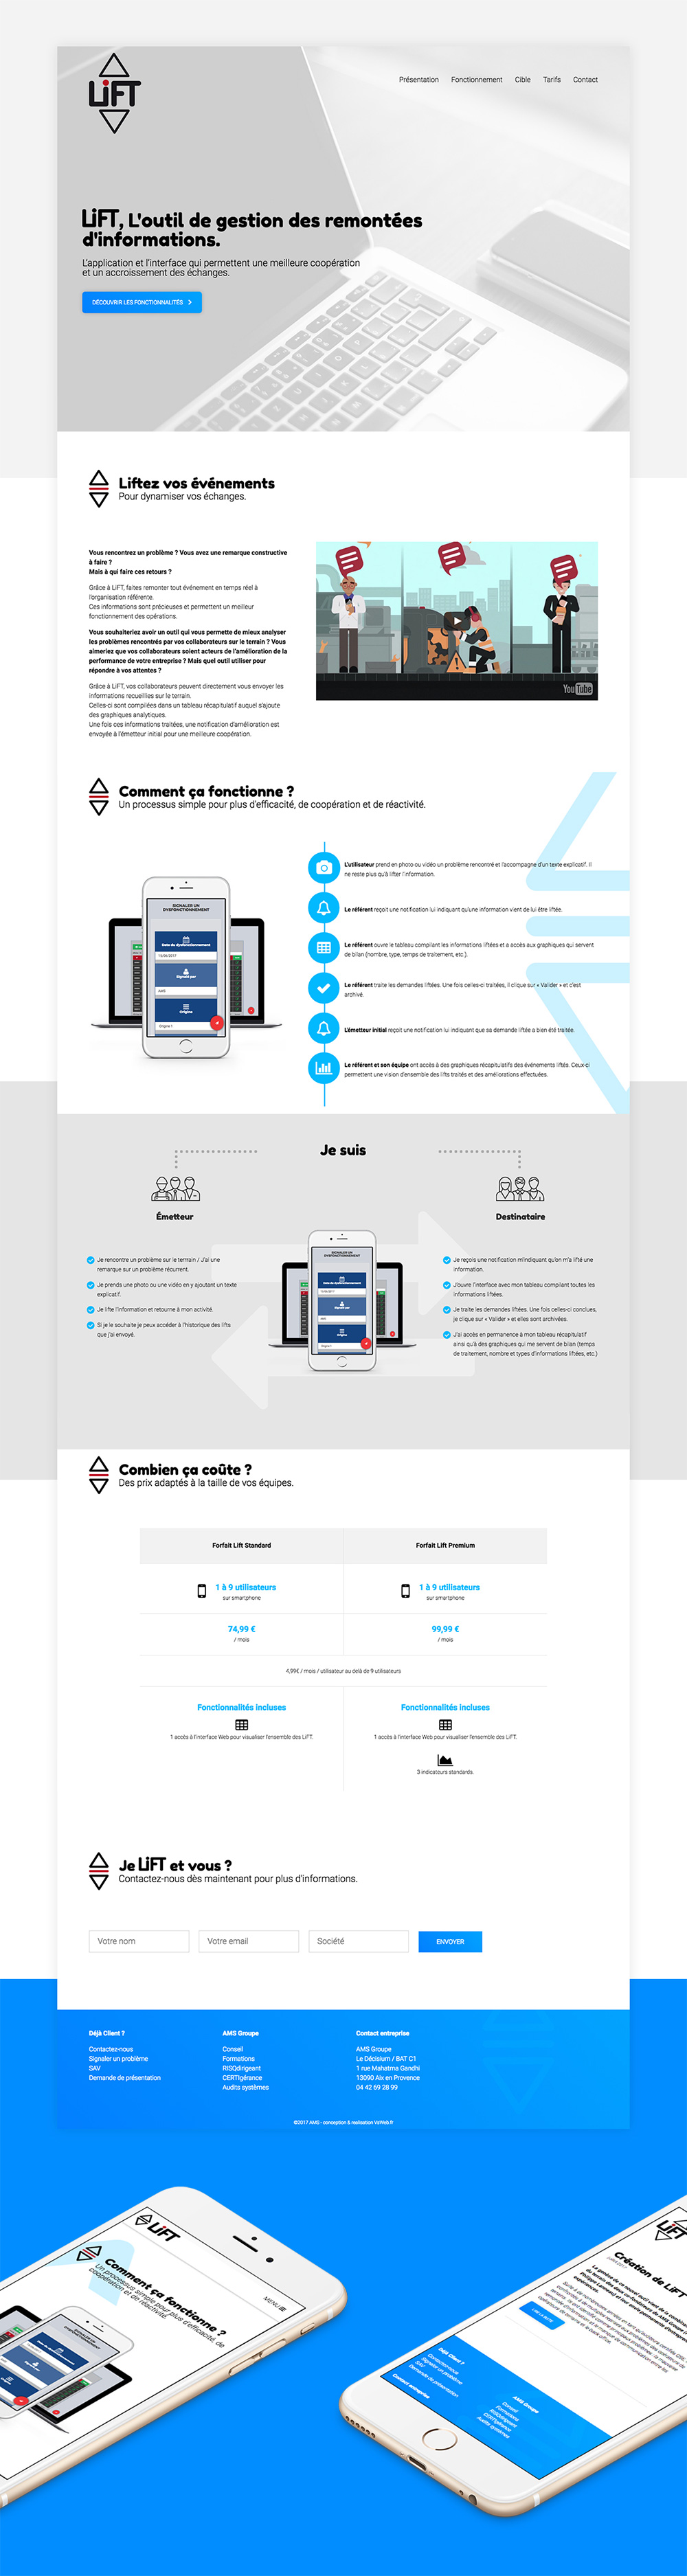 lift app website design